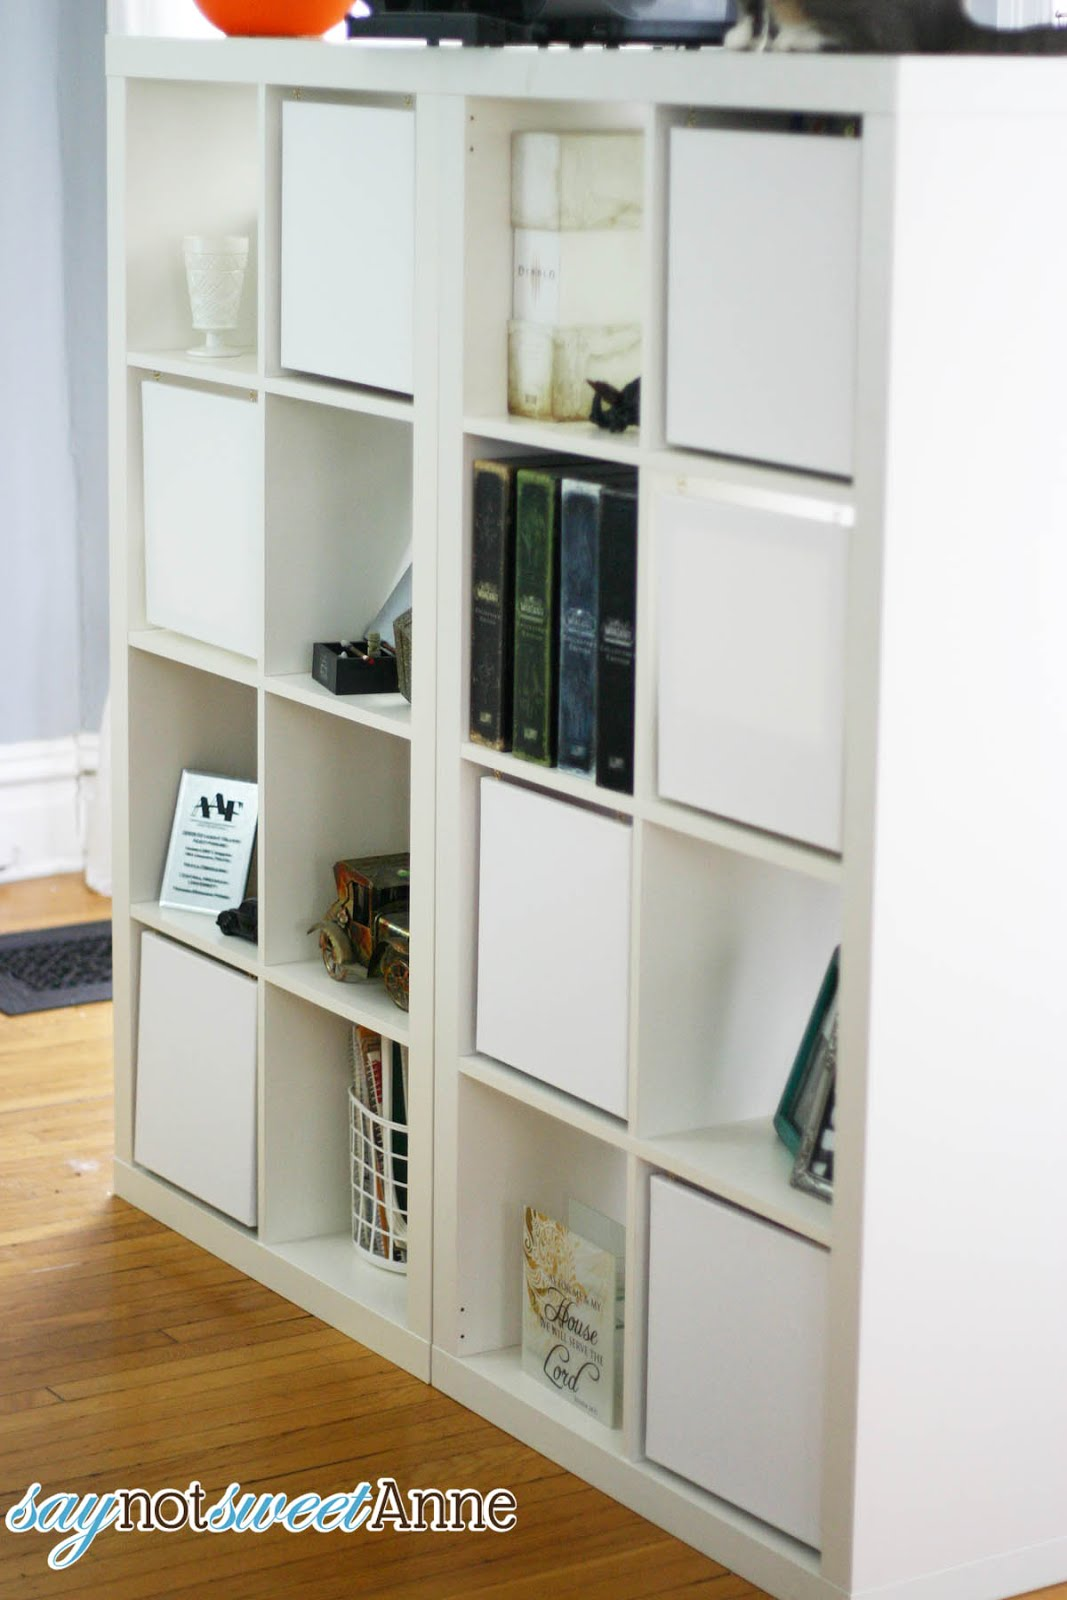 diy des portes home made pour votre expedit initiales gg. Black Bedroom Furniture Sets. Home Design Ideas